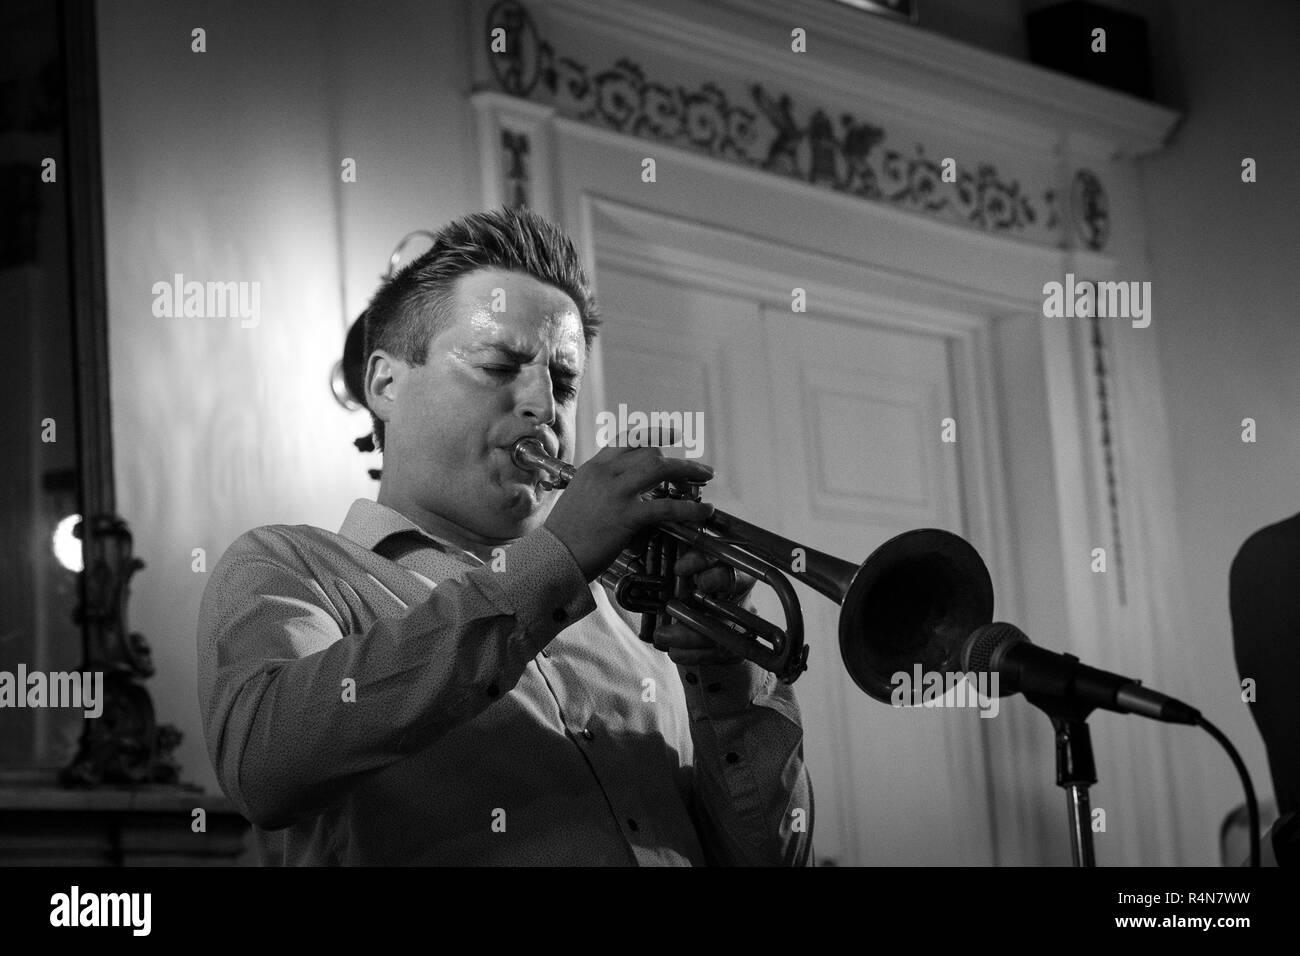 Nick Dewhurst soloing on trumpet with Dennis Rollins, Lichfield 2018